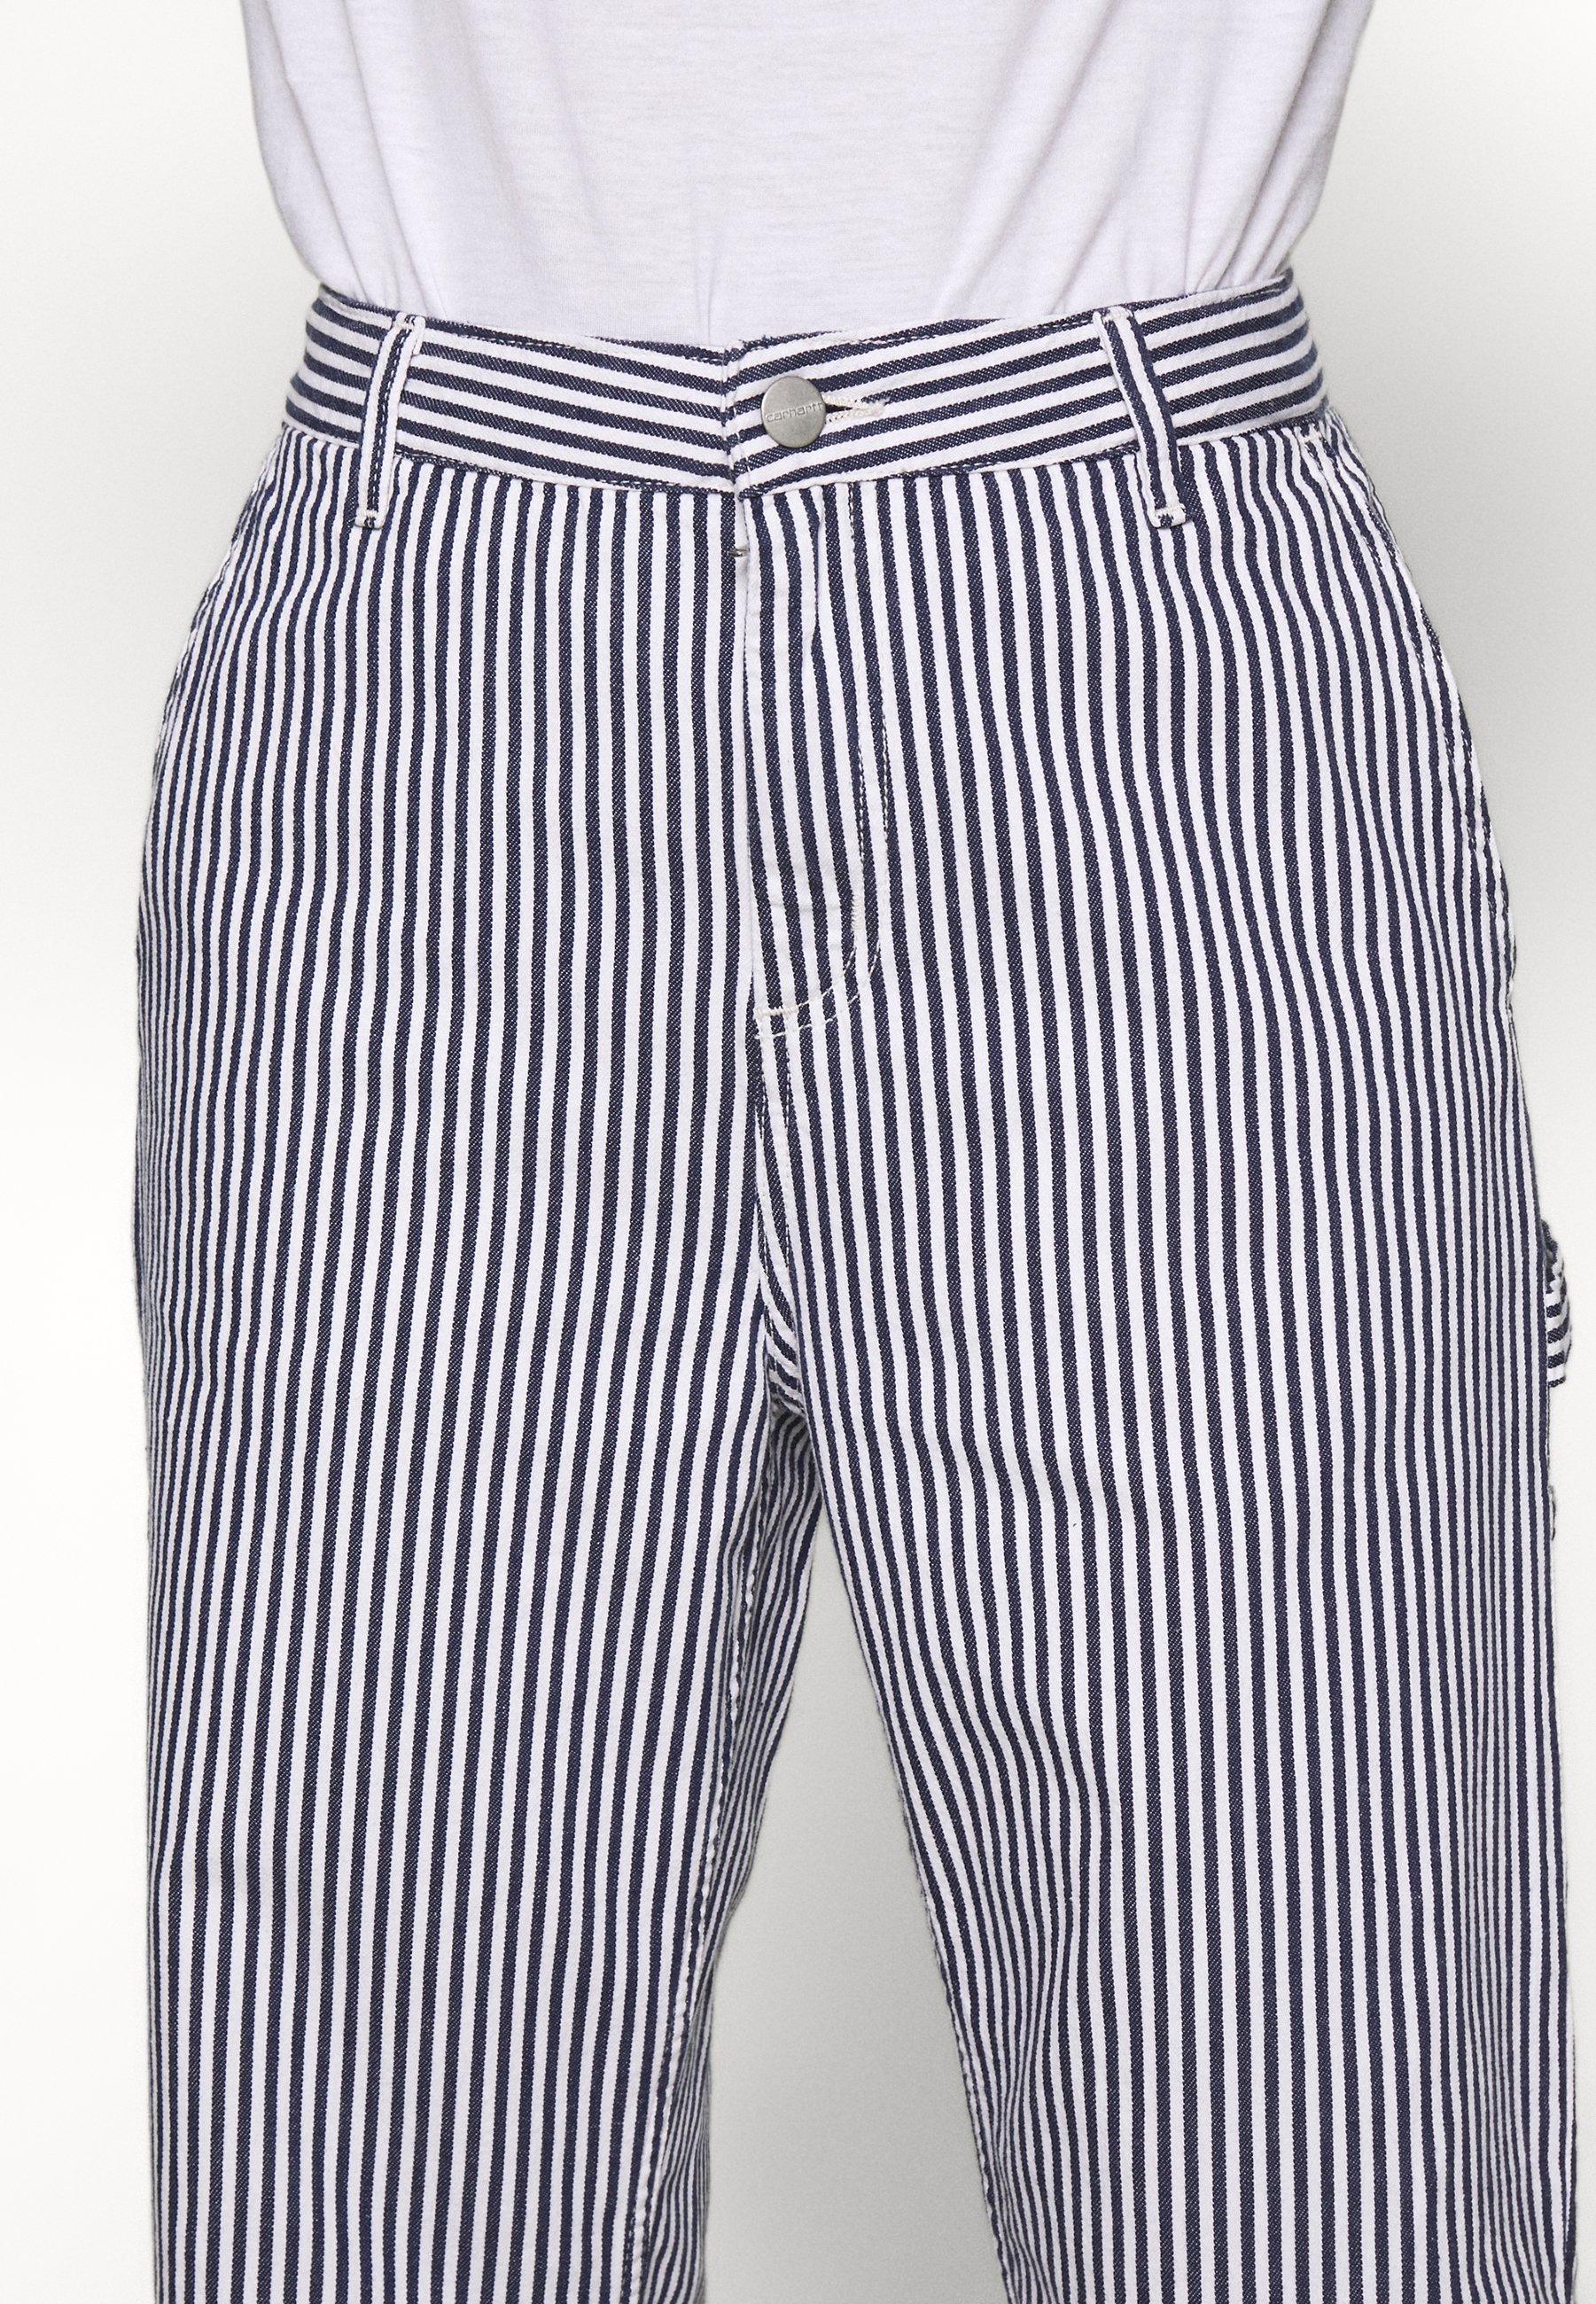 PIERCE PANT STRAIGHT HIALEAH Bukse bluewhite